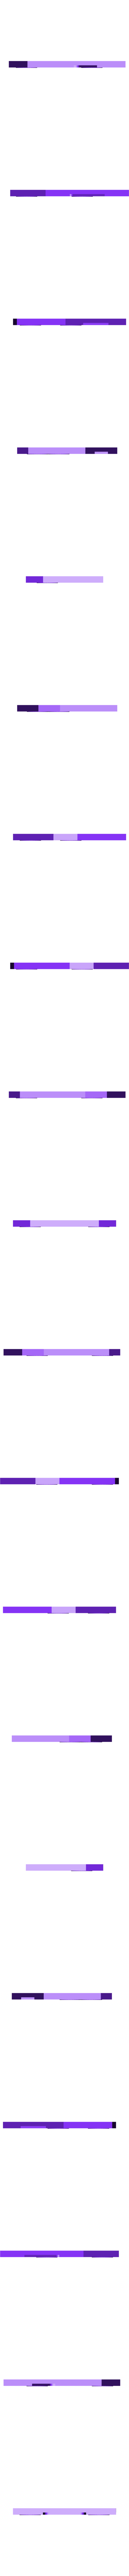 bottom lockplate.stl Download free STL file Fortnite Chest  • 3D print template, blecheimer